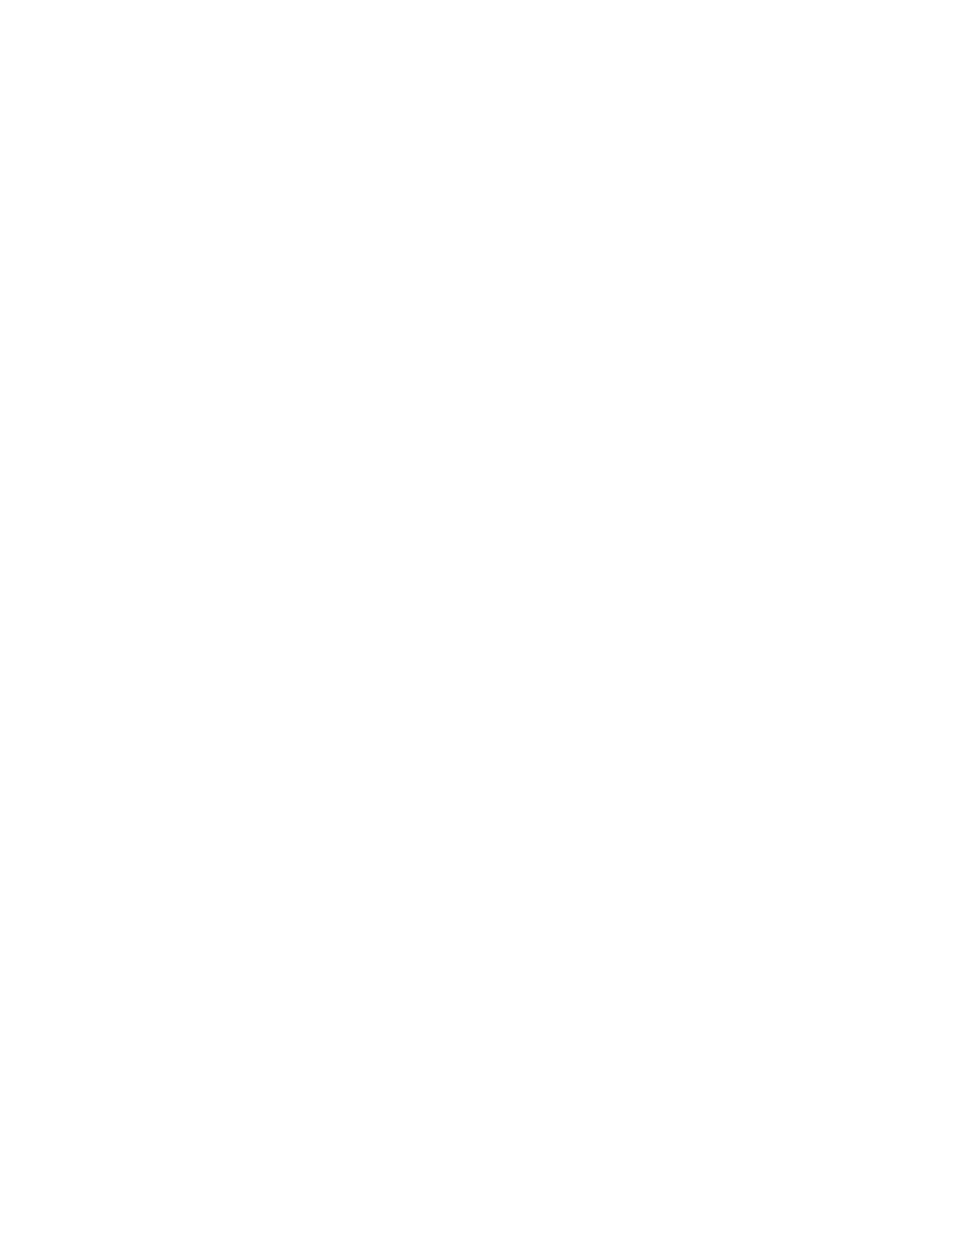 scytek electronics g20 page7 valet mode, battery replacement scytek electronics g20 user scytek g20 wiring diagram at bakdesigns.co